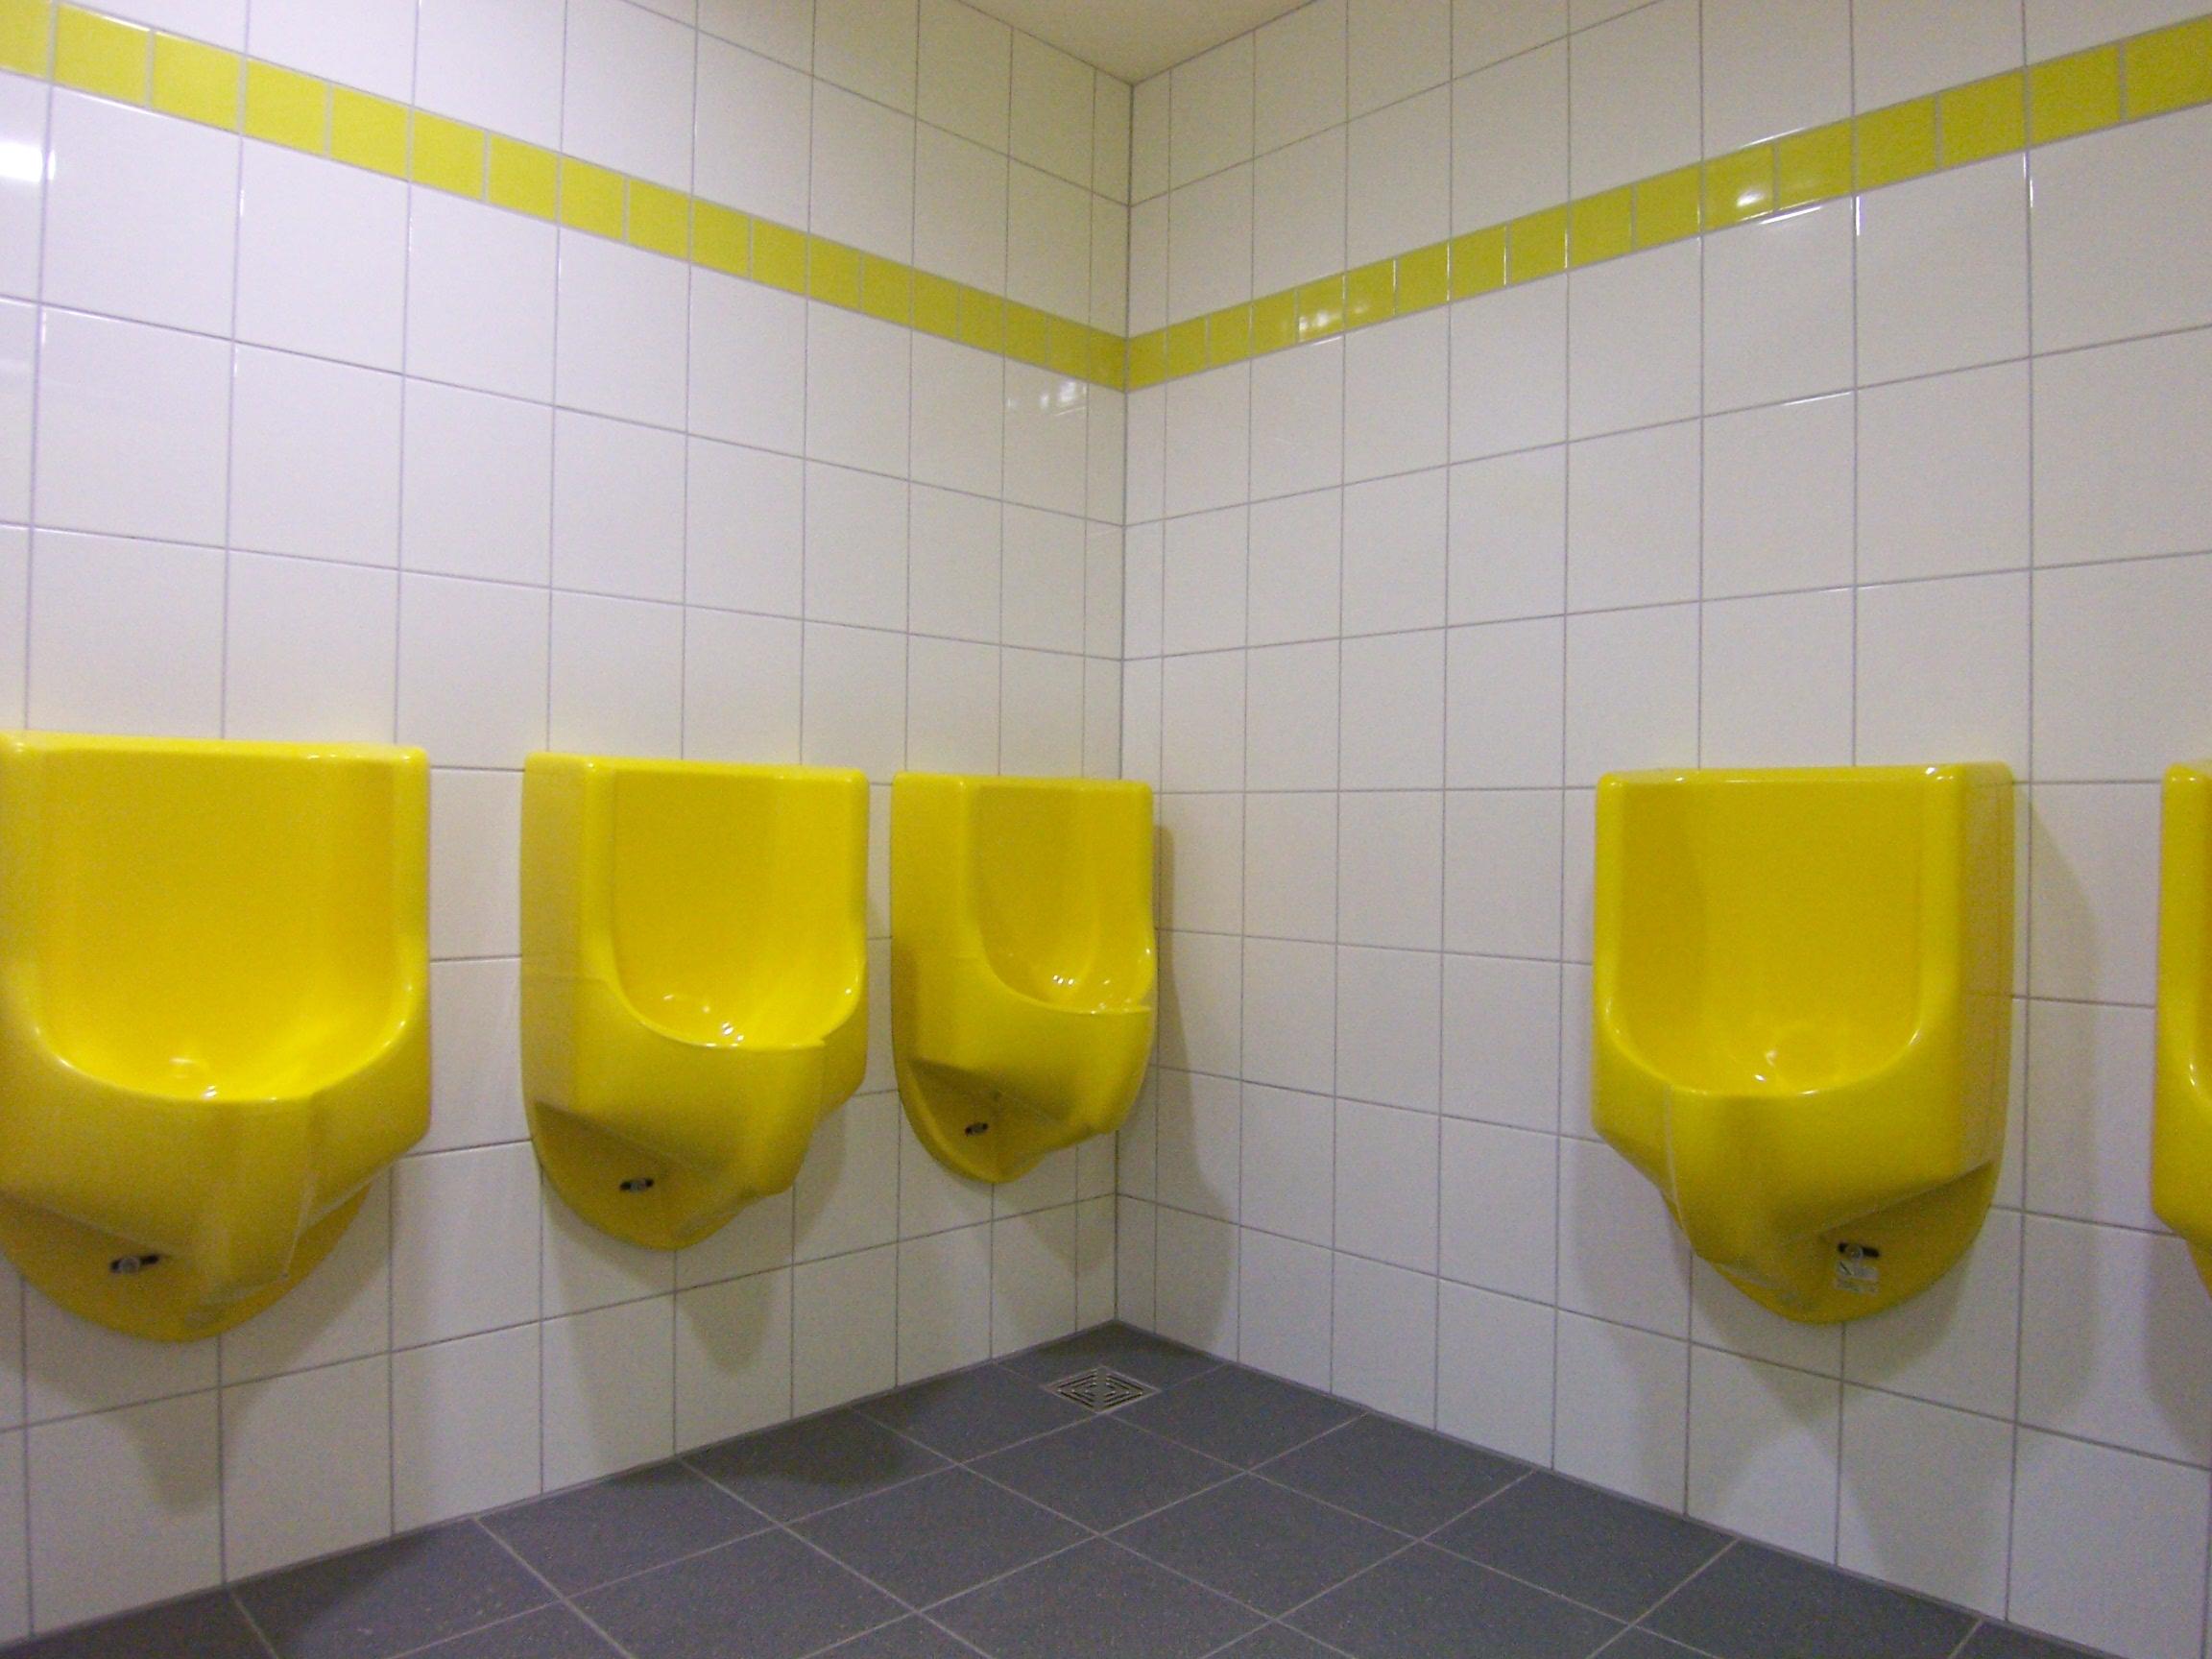 waterless urinal, water saving urinal